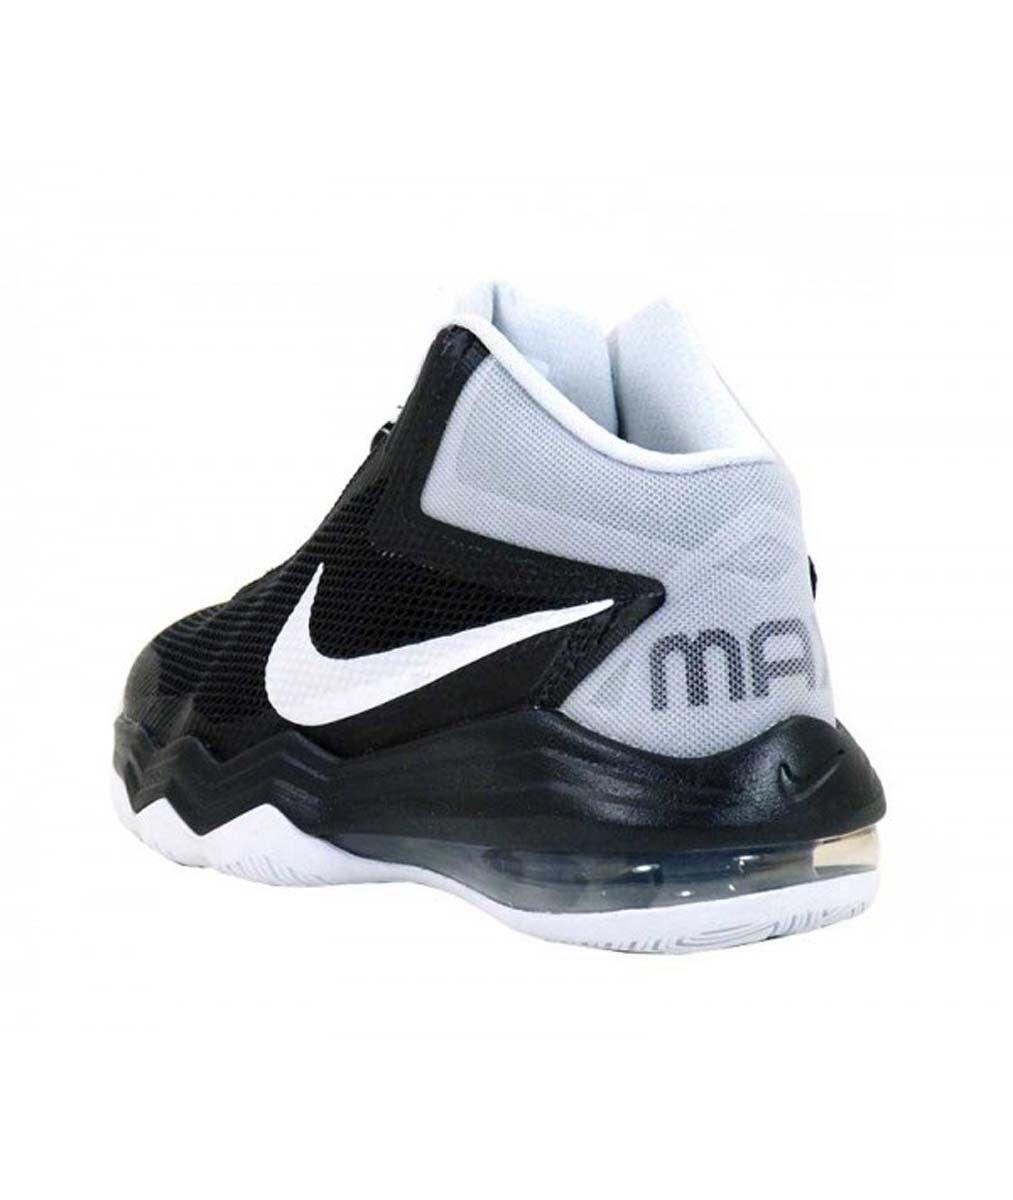 749166 nike air max audacia uomini neri basket scarpe alte scarpe 10